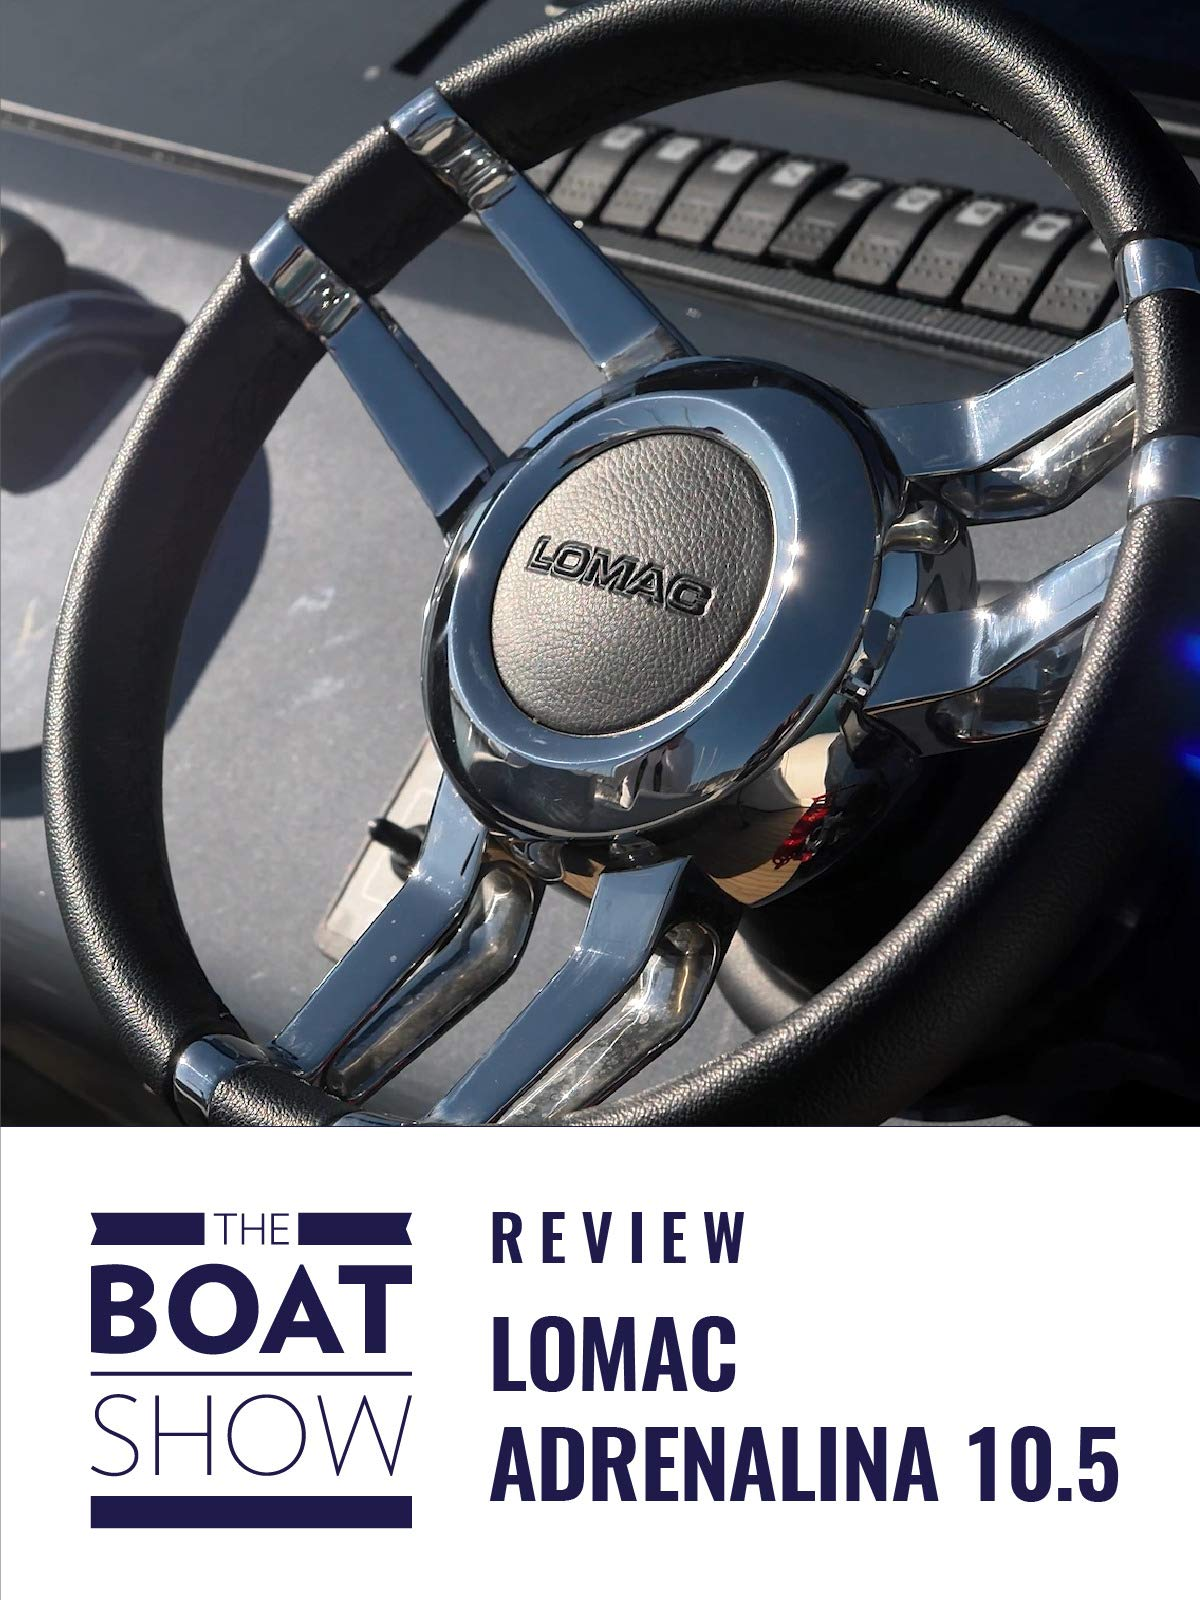 Clip: Lomac Adrenalina 10.5 - The Boat Show